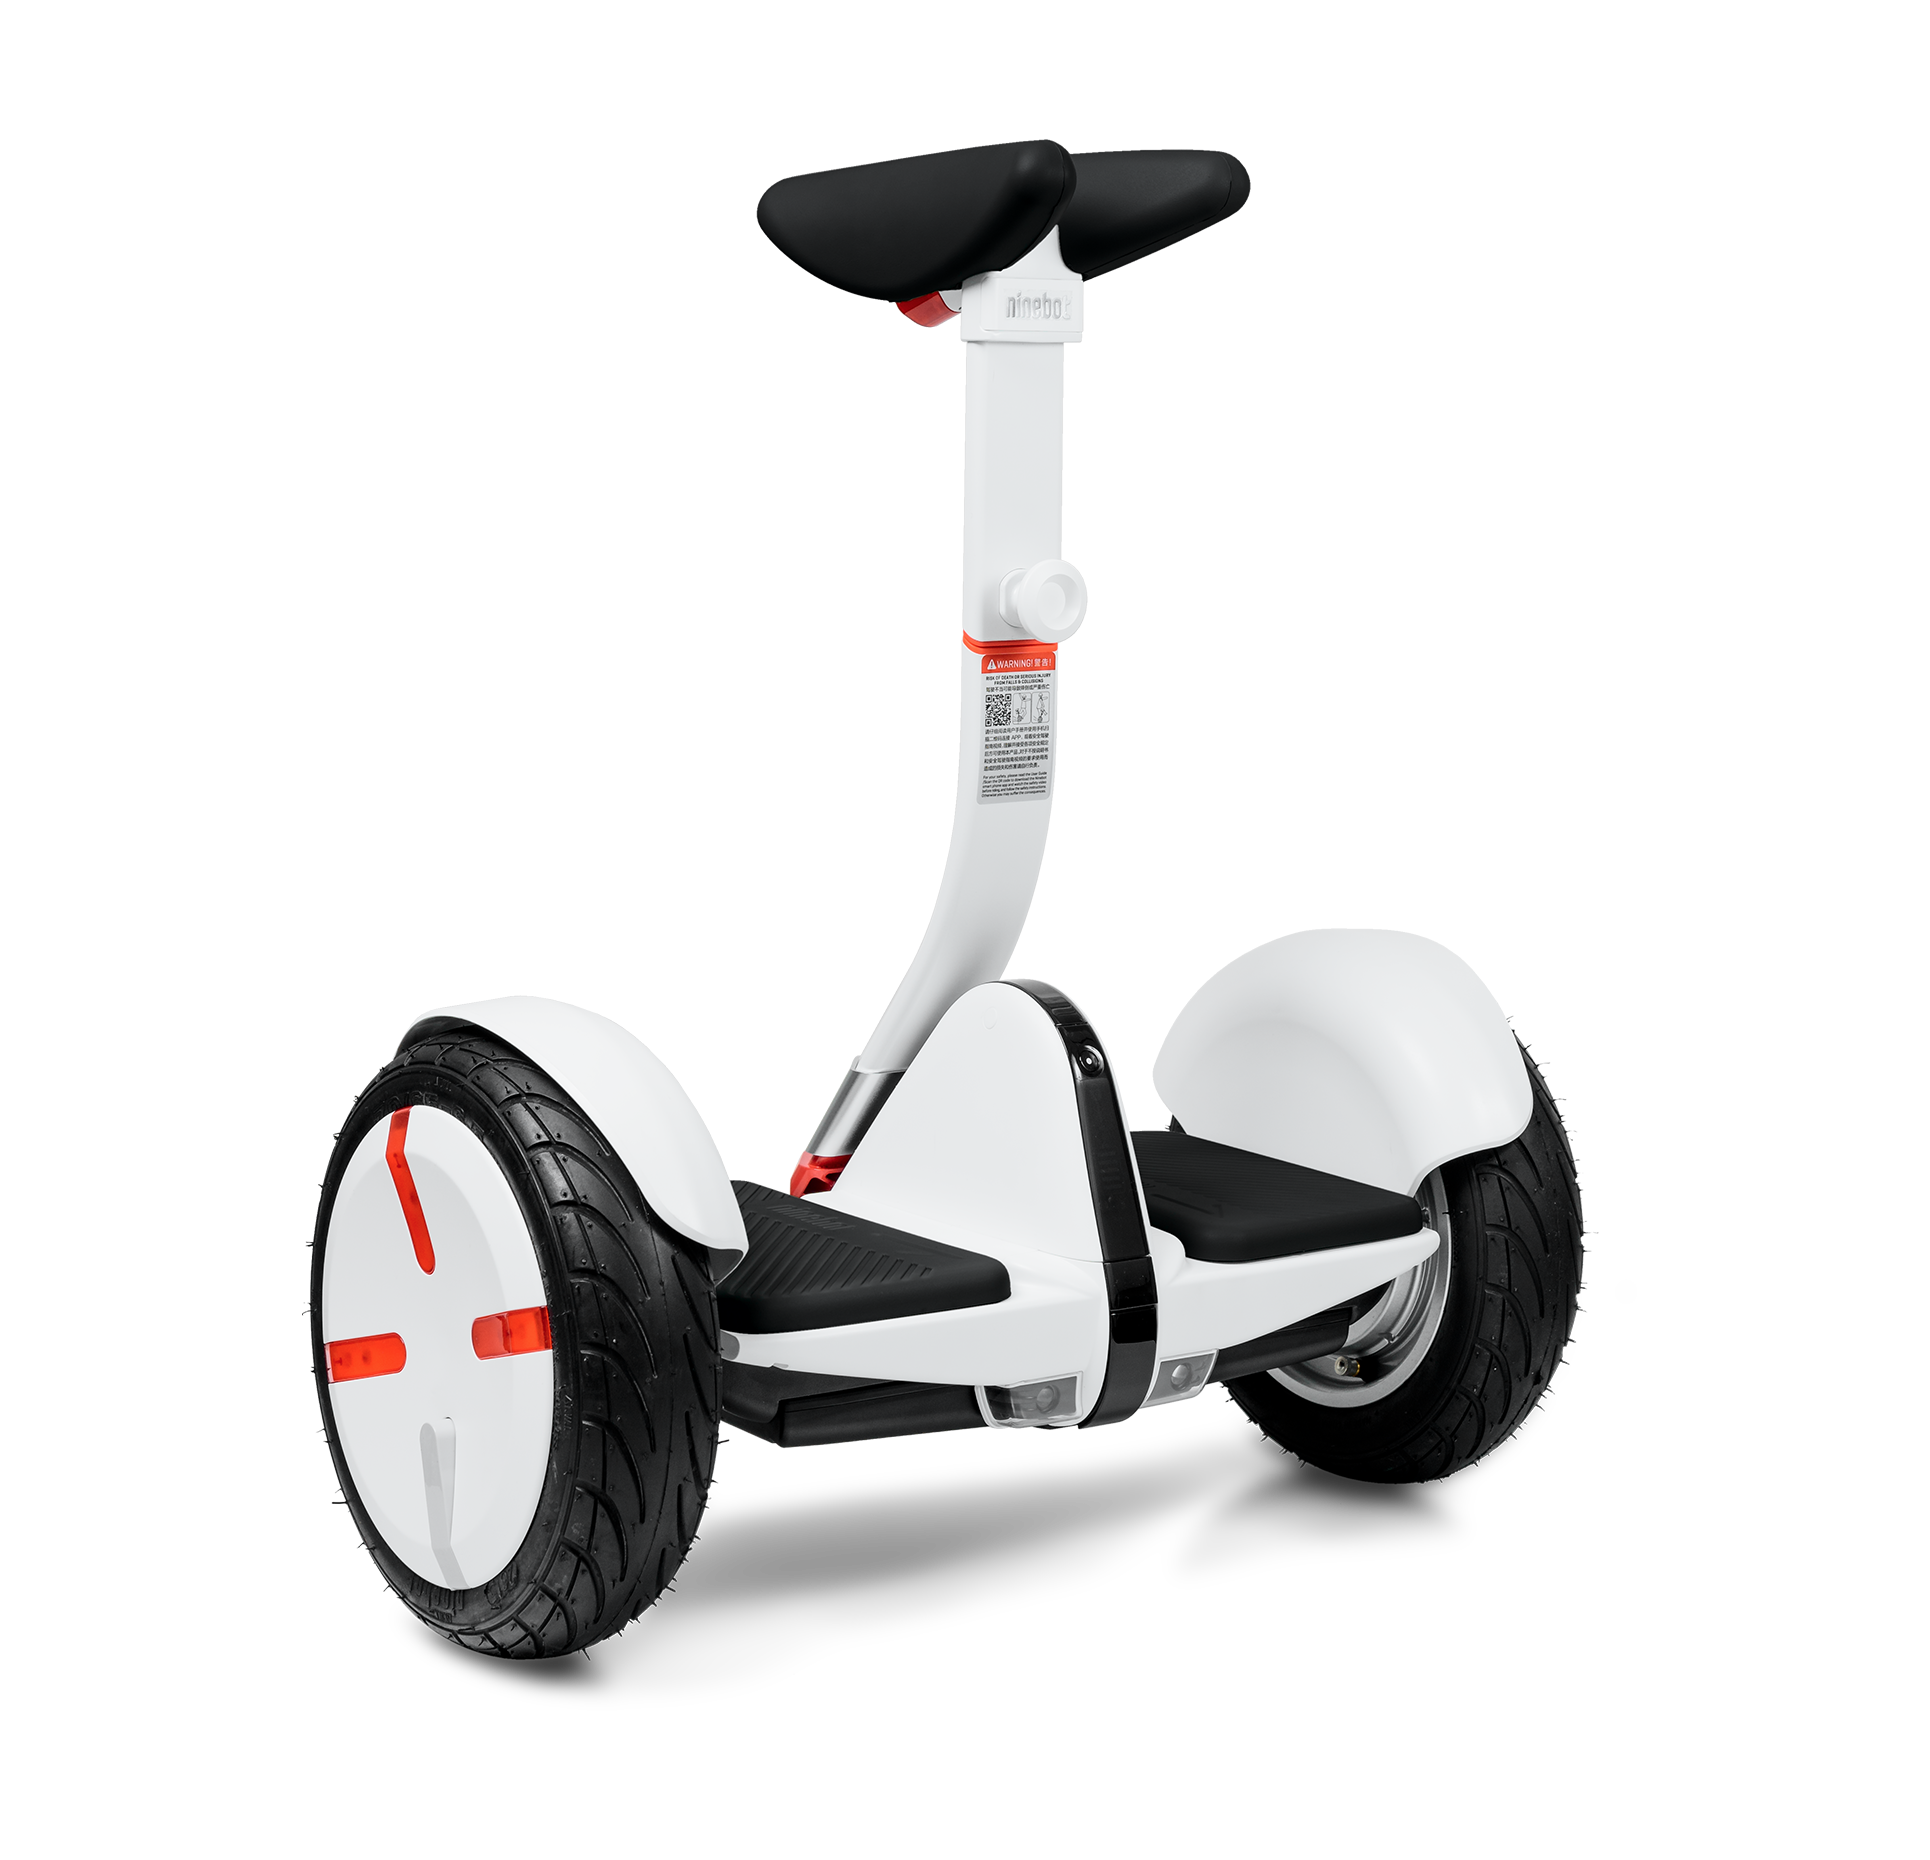 ninebot minipro by segway lta approved e scooter. Black Bedroom Furniture Sets. Home Design Ideas